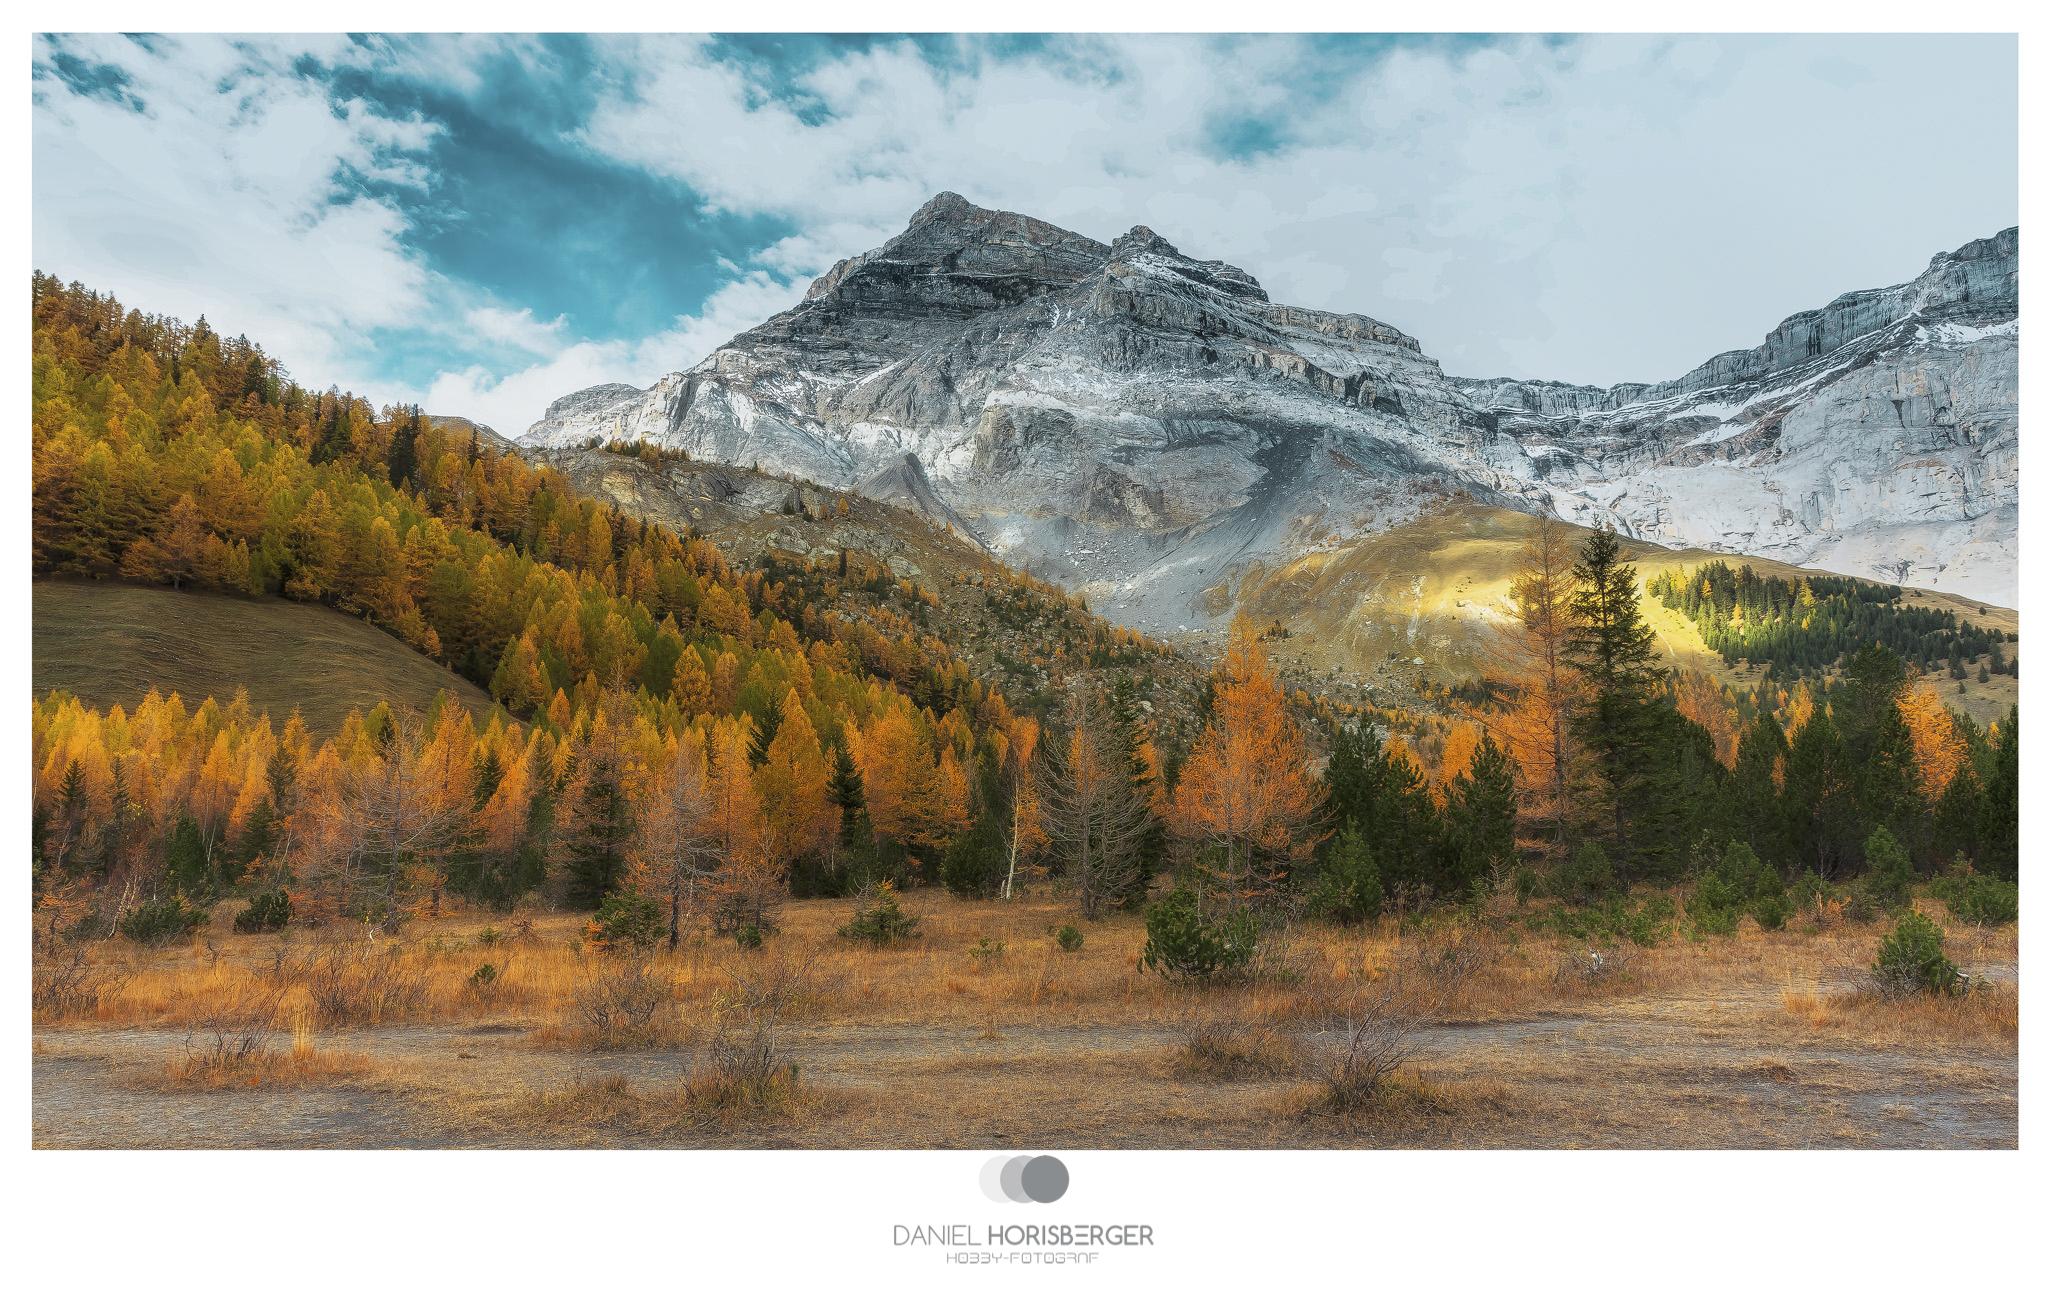 Wald-Berge-Finish  GZD -Rahmen - 2048